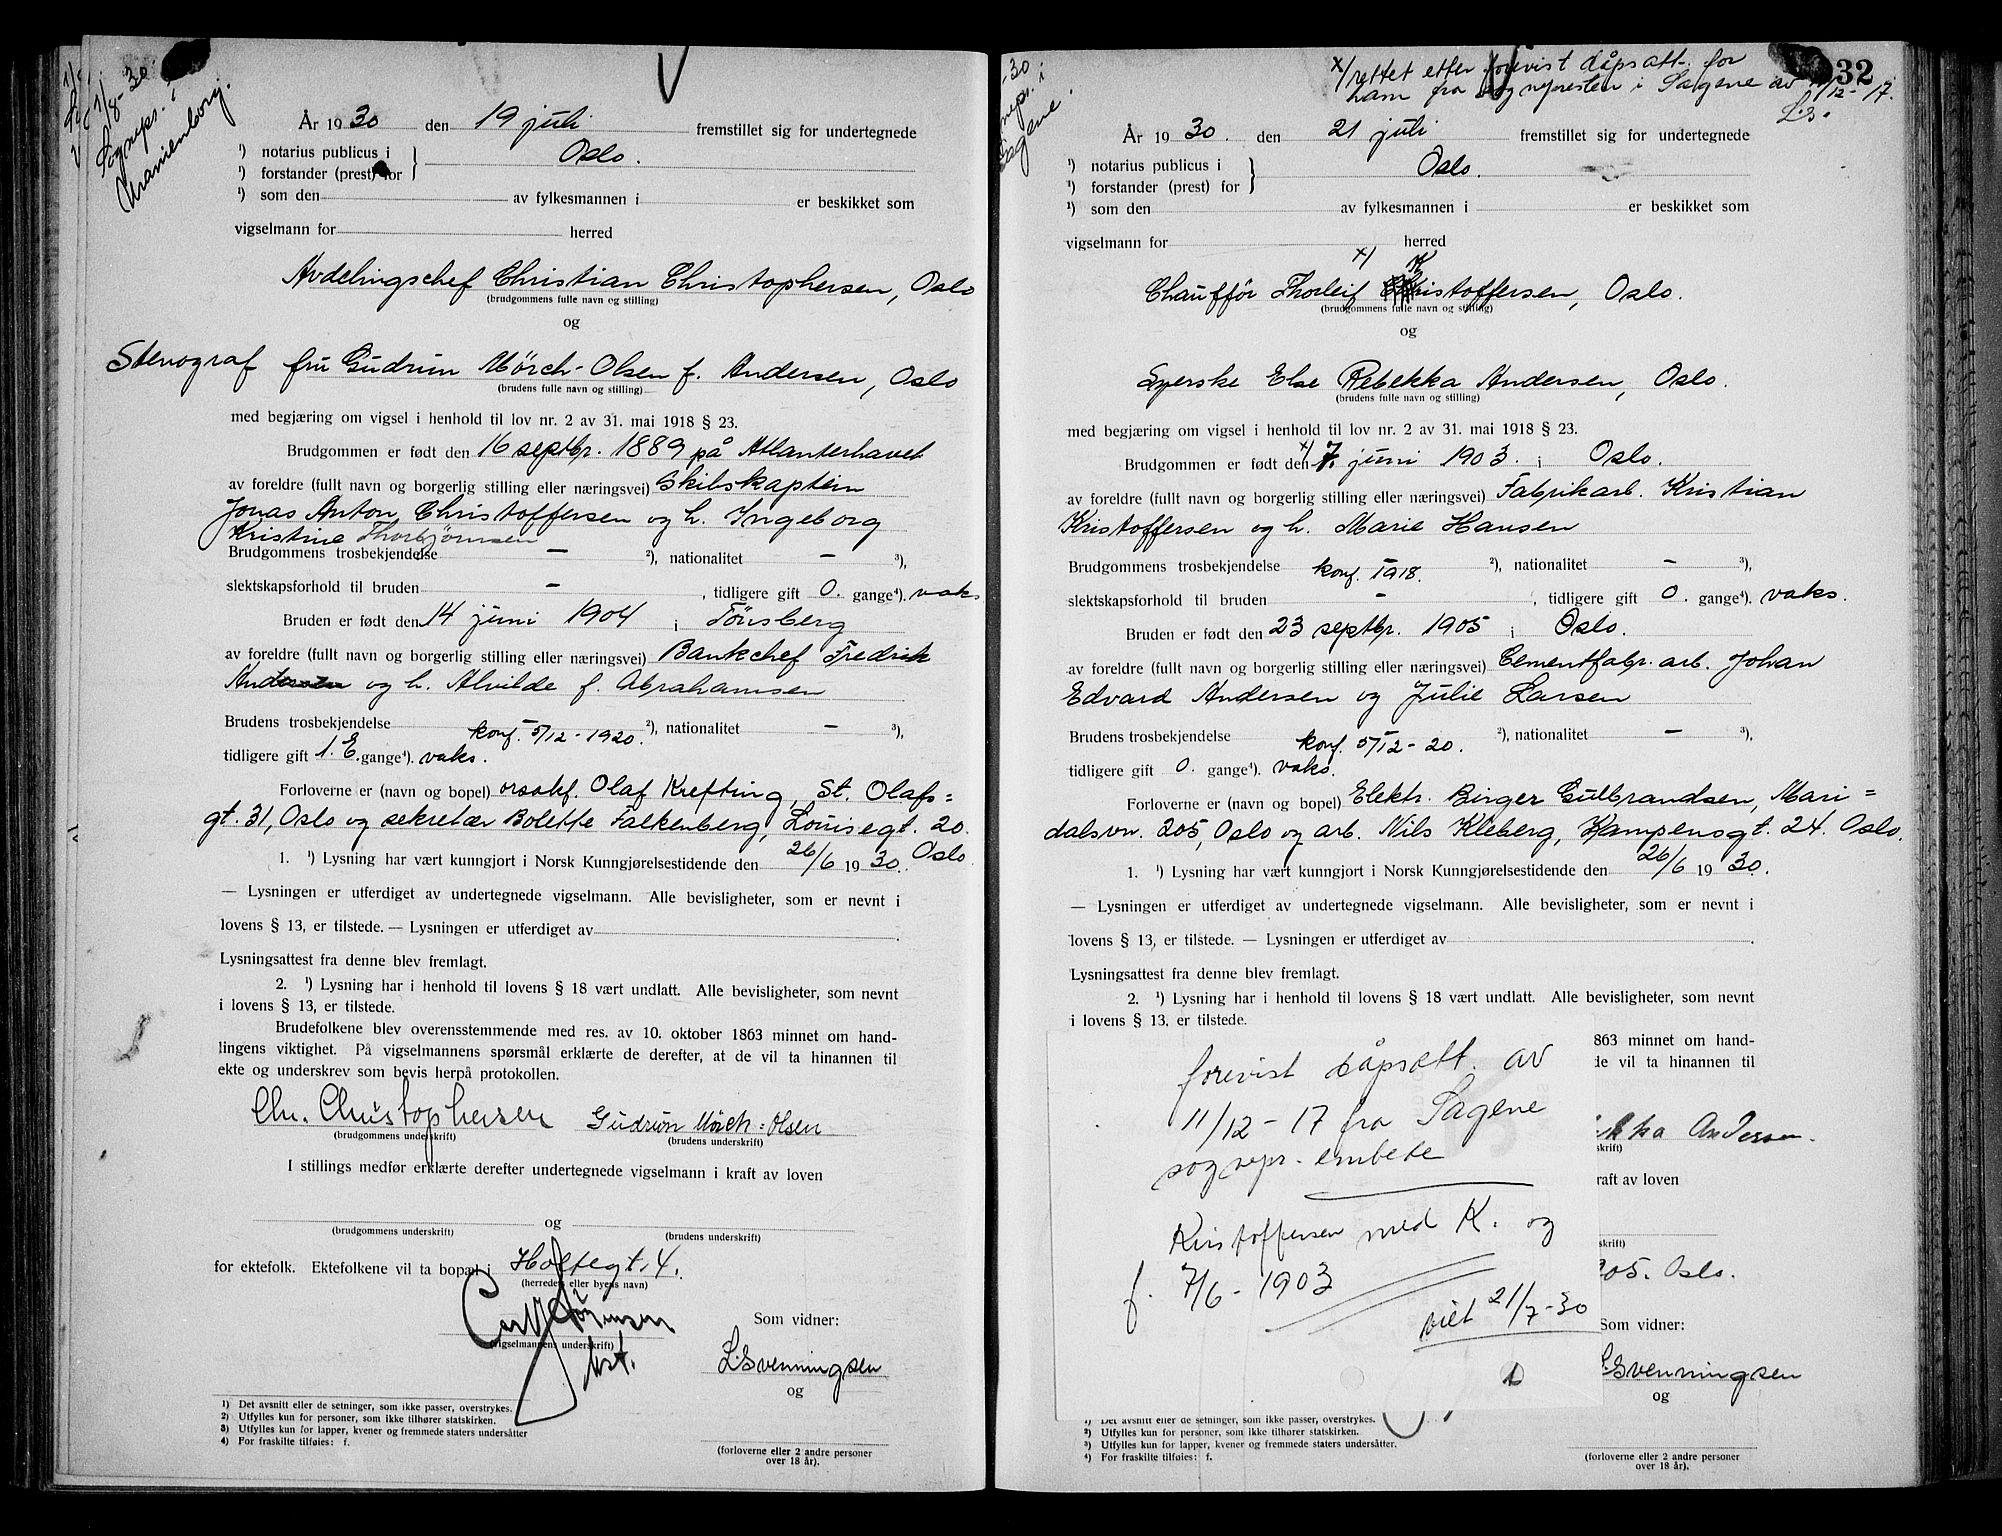 SAO, Oslo byfogd avd. I, L/Lb/Lbb/L0020: Notarialprotokoll, rekke II: Vigsler, 1929-1930, s. 31b-32a